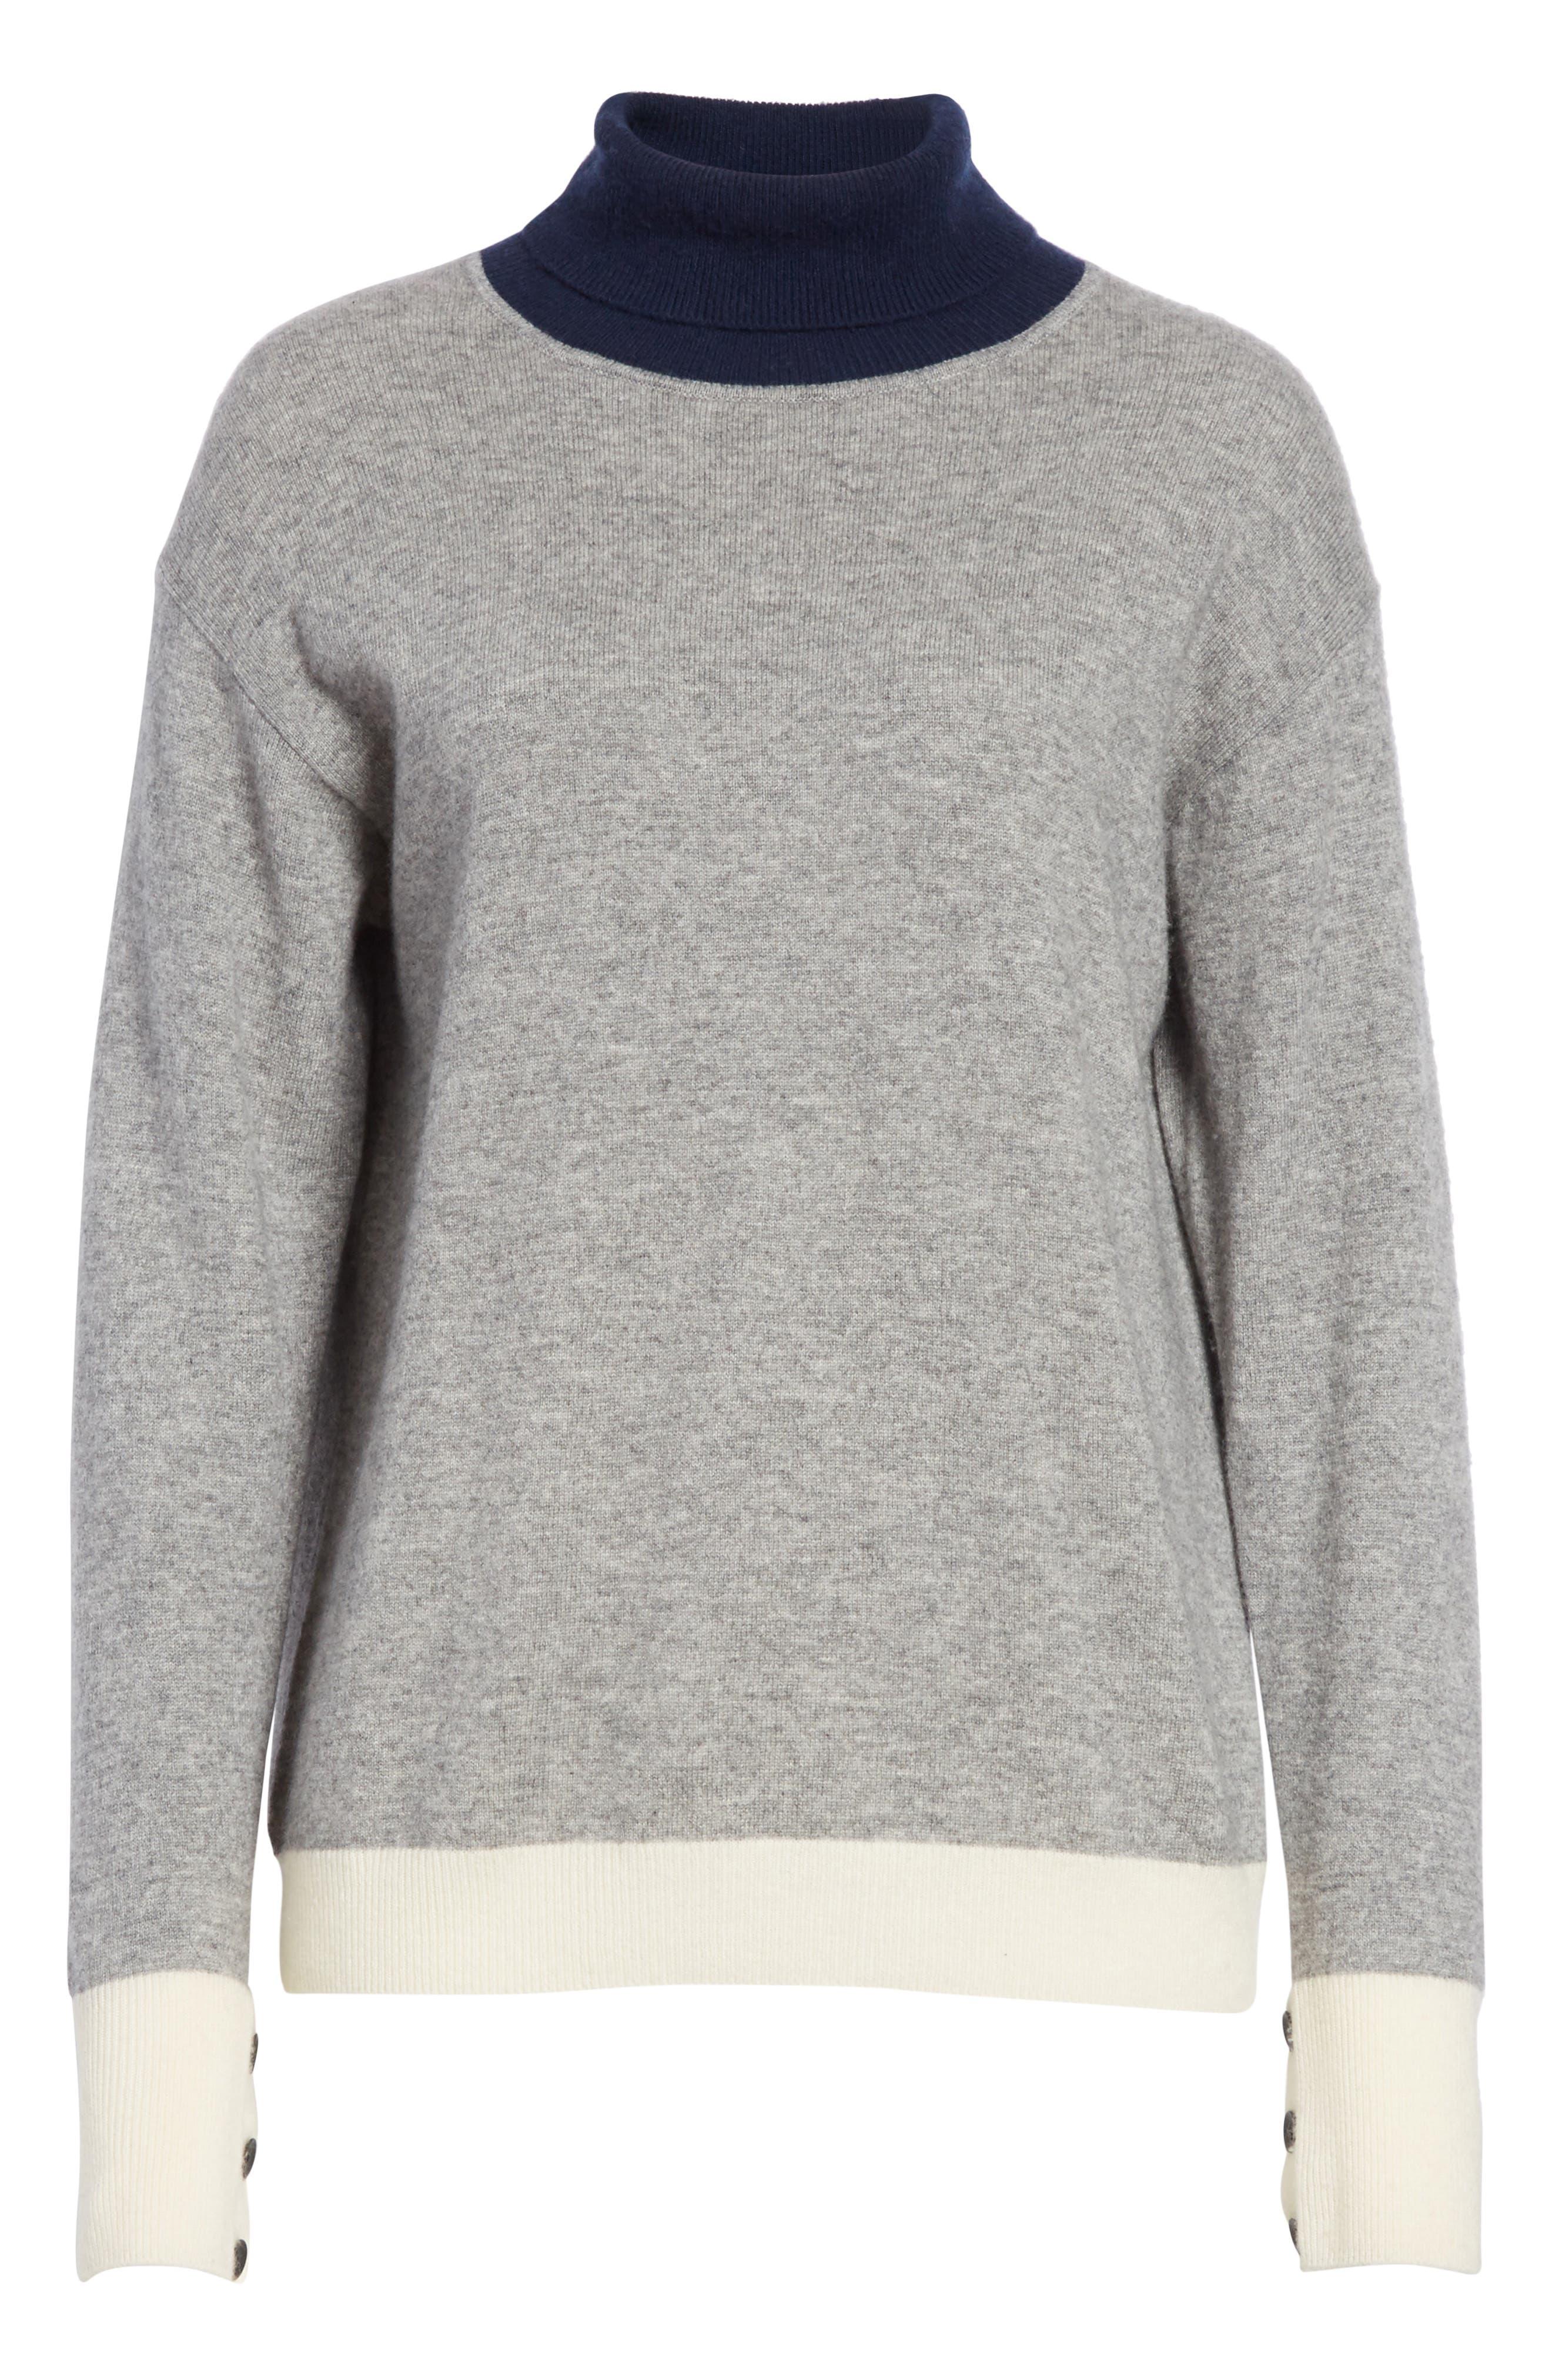 Rhea Wool & Cashmere Turtleneck Sweater,                             Alternate thumbnail 6, color,                             Grey Heather